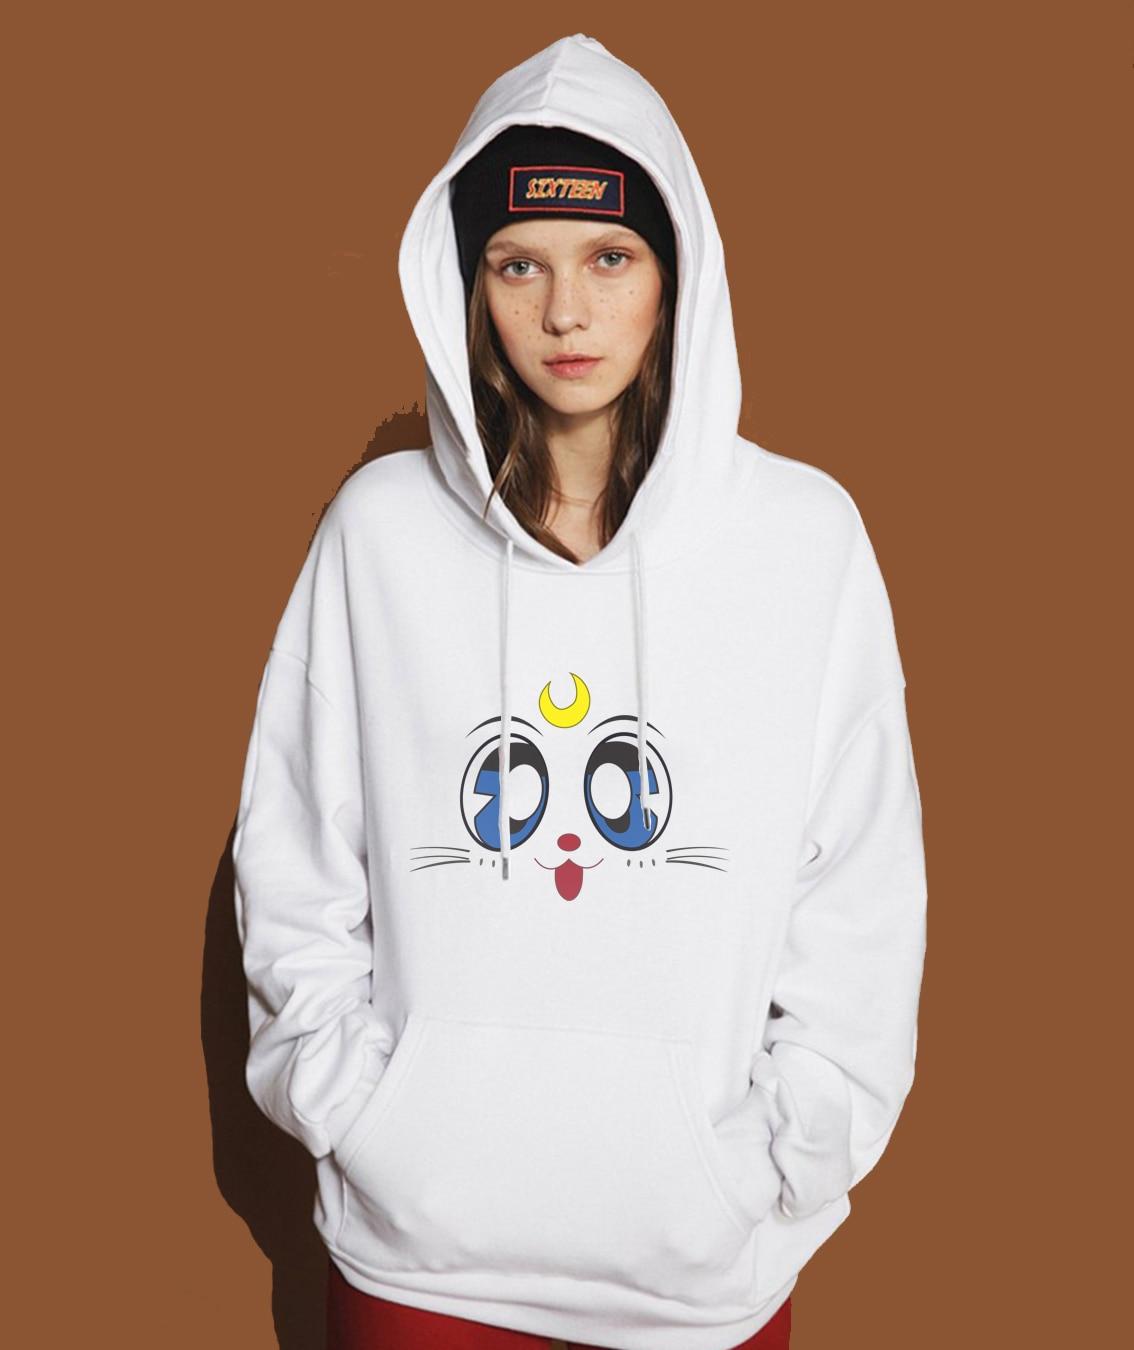 New Arrival Hot Female Sweatshirt 2019 Spring Winter Fleece Brand Clothing Hoodies For Women Hip Hop Streetwear Cute Sailor Moon